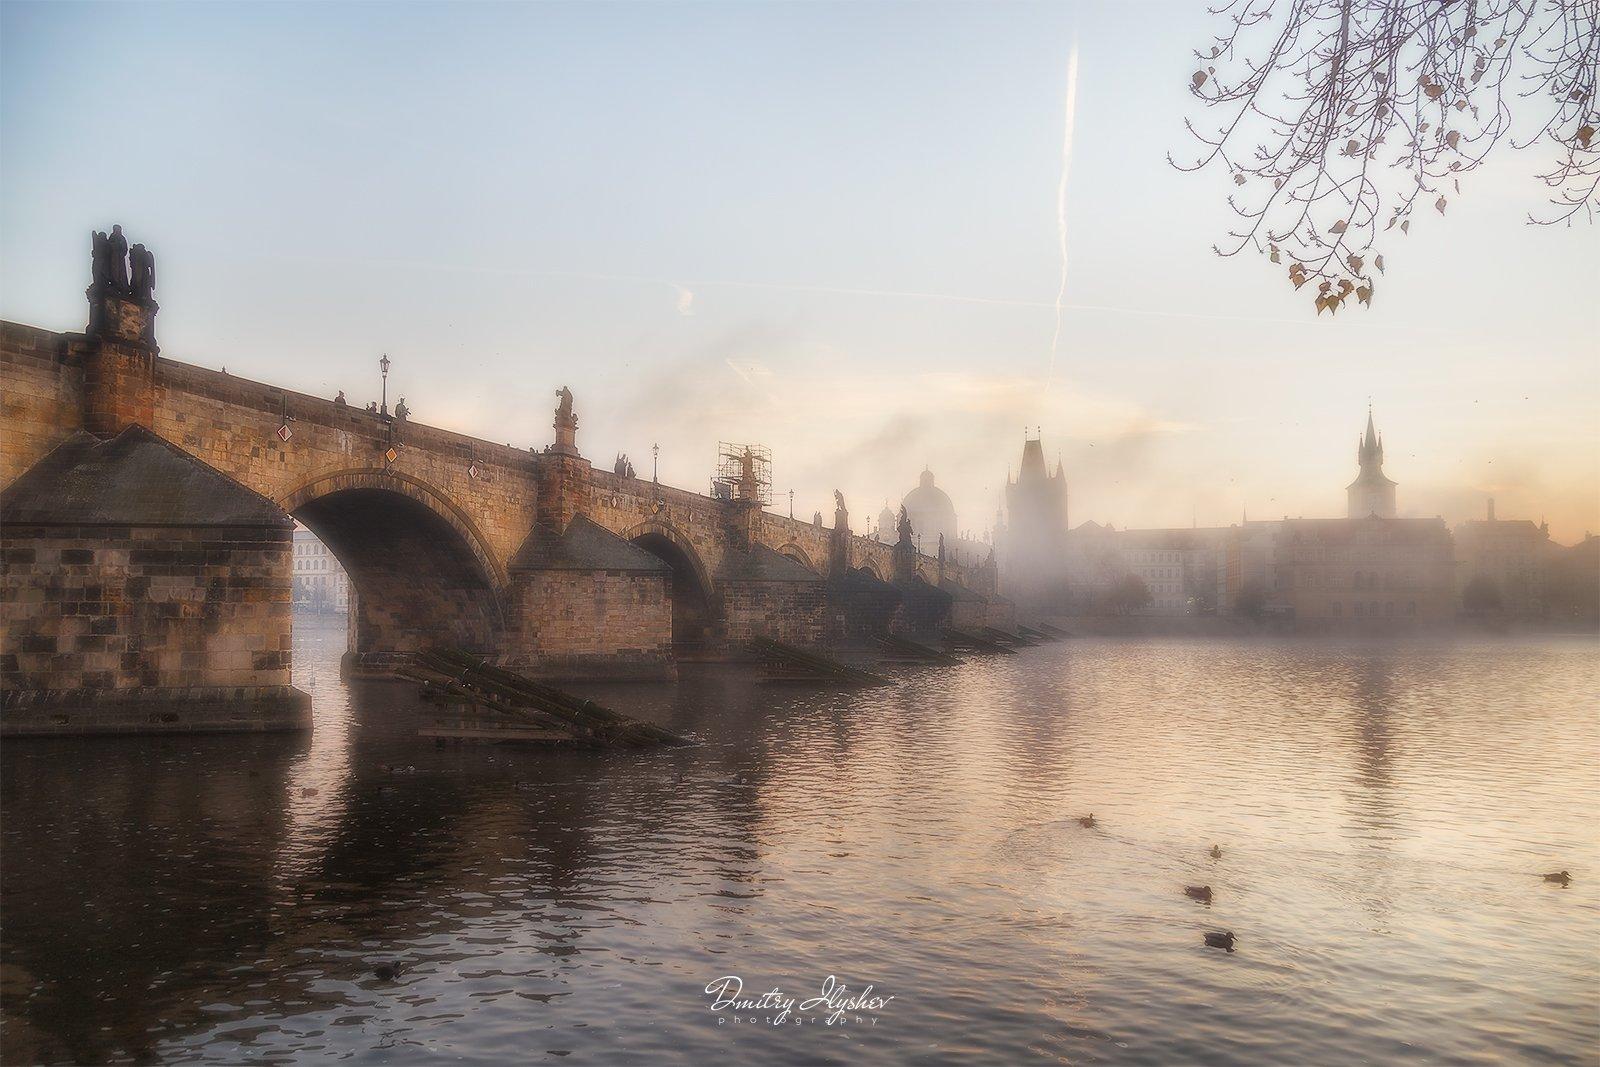 Прага, Чехия, Карлов мост, утро, туман, Влтава, река, мост, природа, путешествие, фототур, Илышев, Дмитрий Илышев (ilyshev.photo)